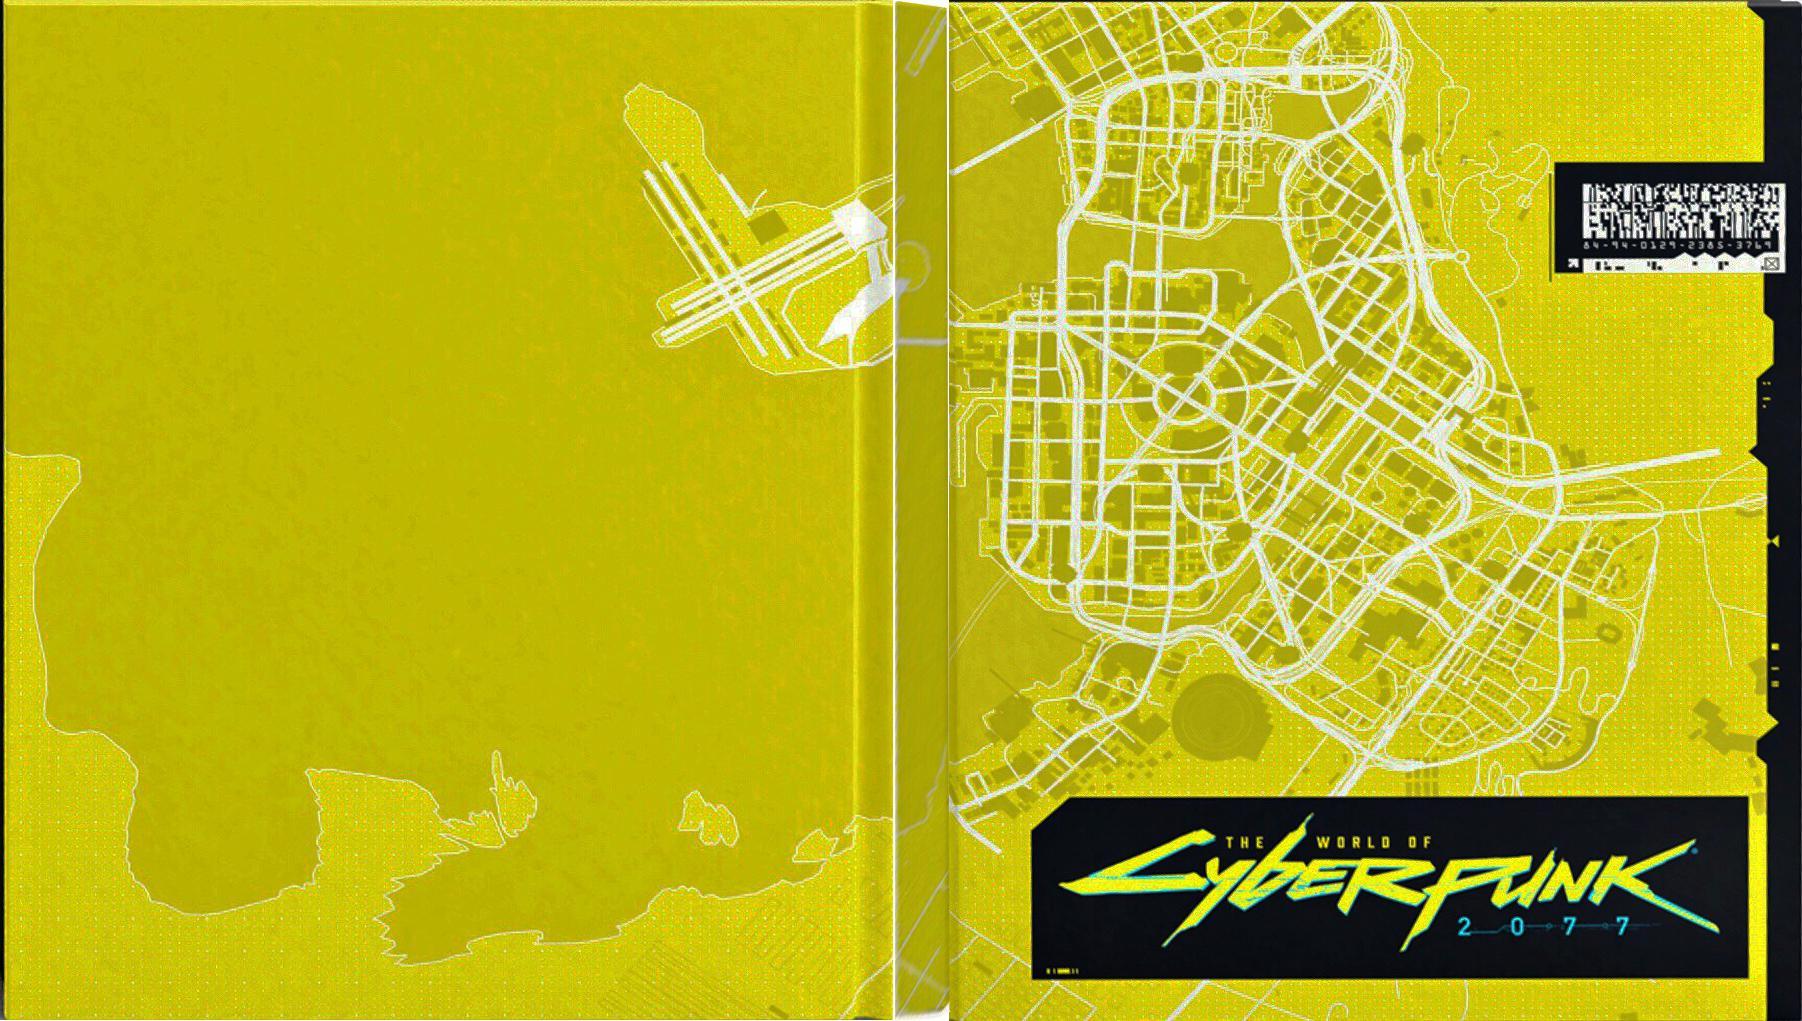 Cyberpunk 2077 – The World of Cyberpunk 2077 Cover